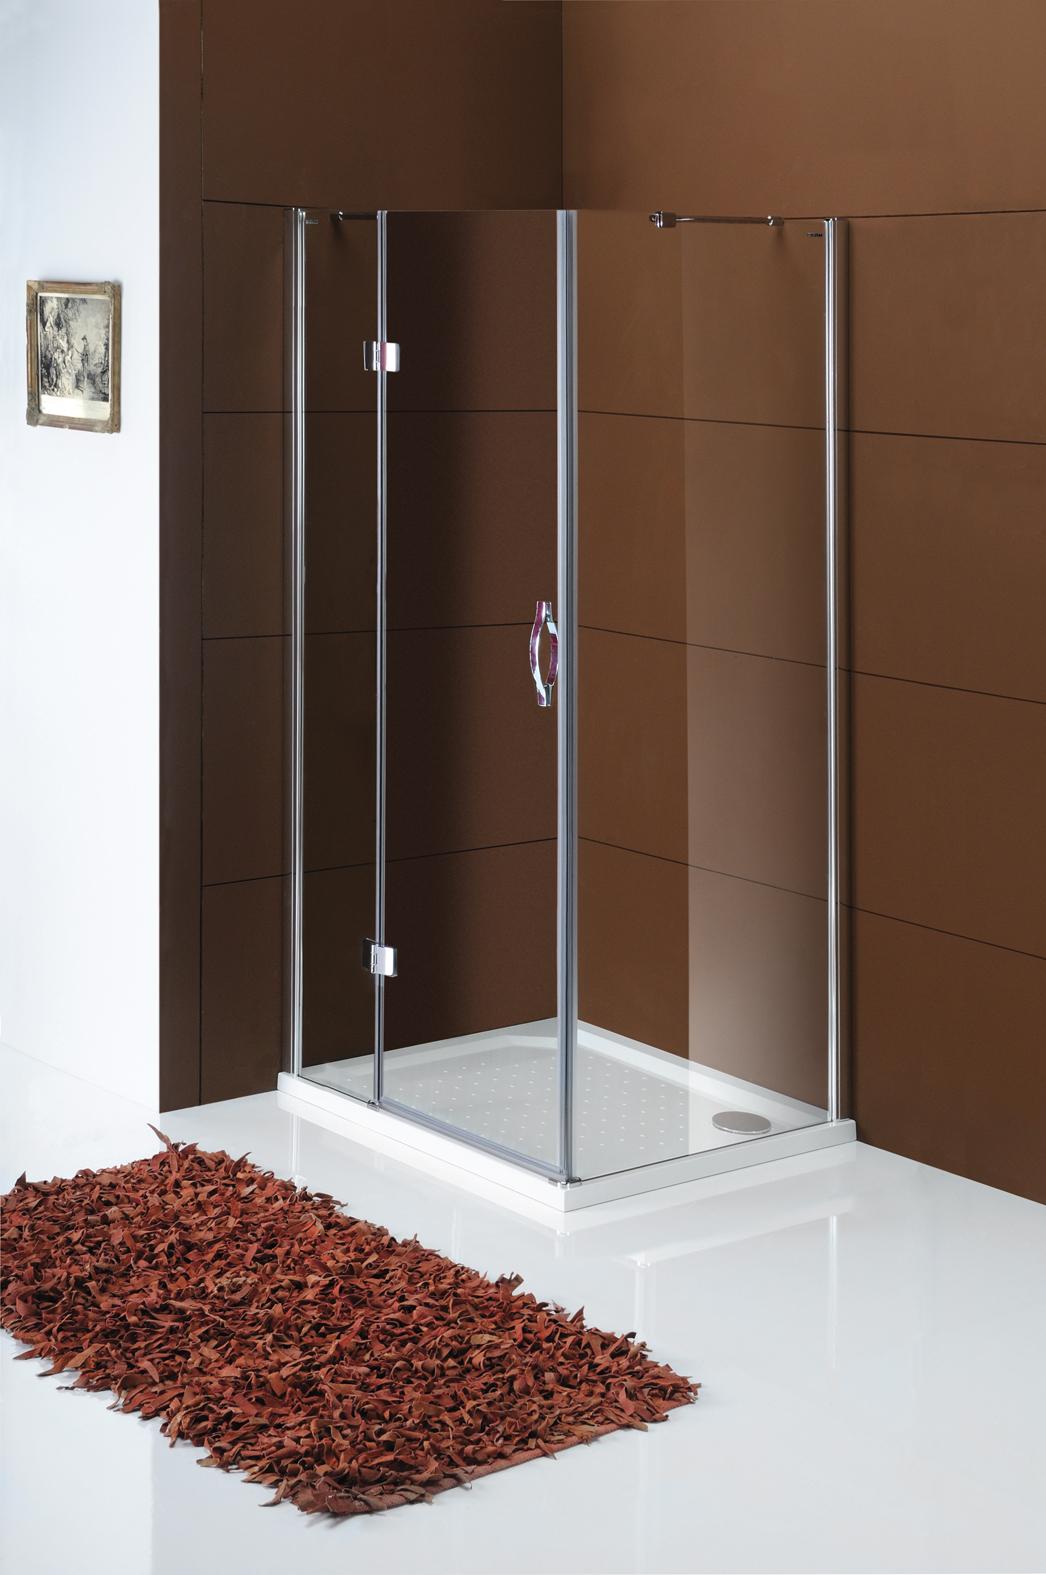 Gelco Sprchové dveře Legro jednodílné otočné 90 cm, sklo čiré/leštěný profil GL1190